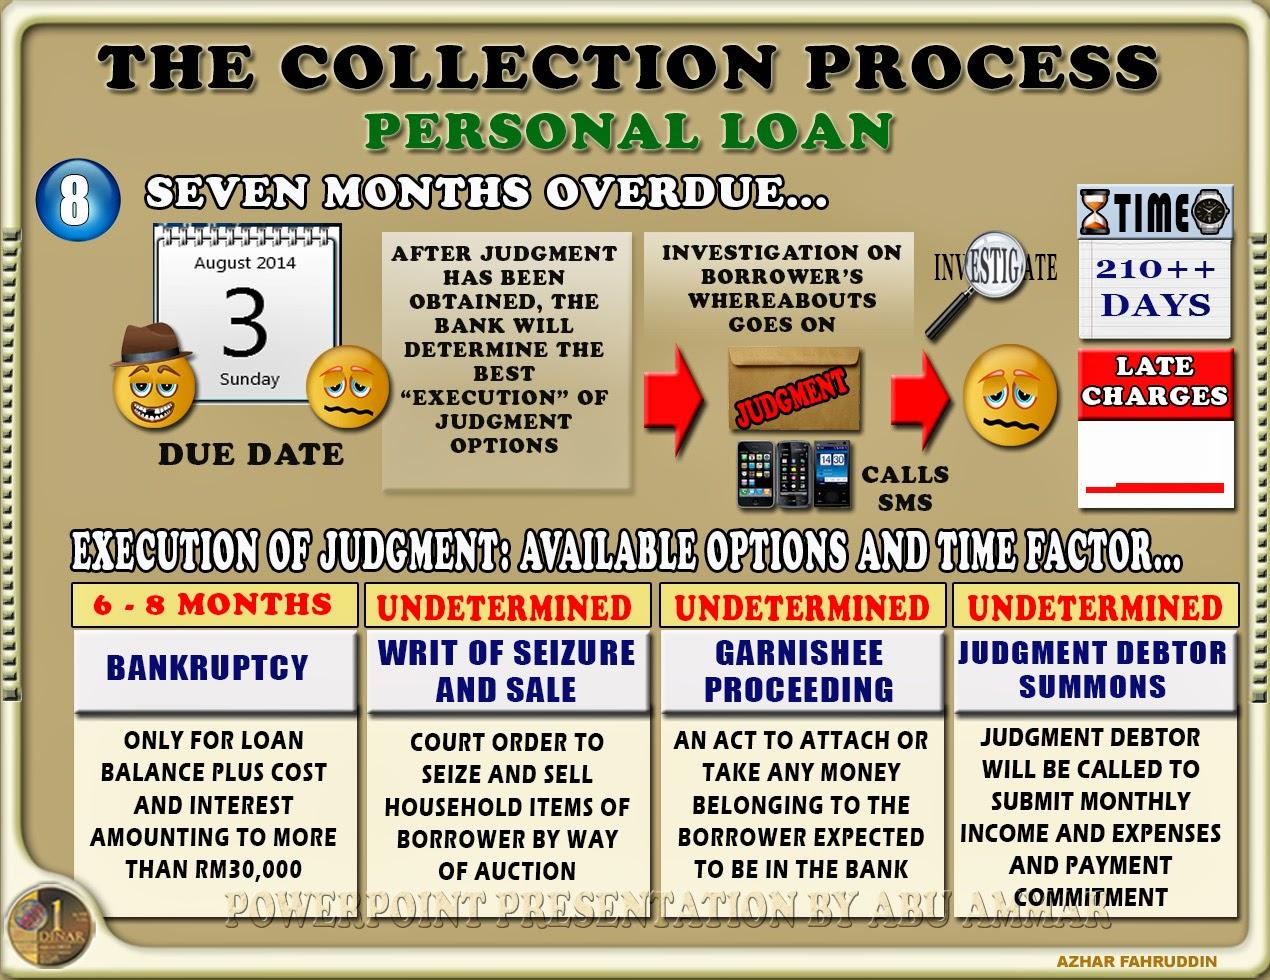 Payday loans circleville image 2